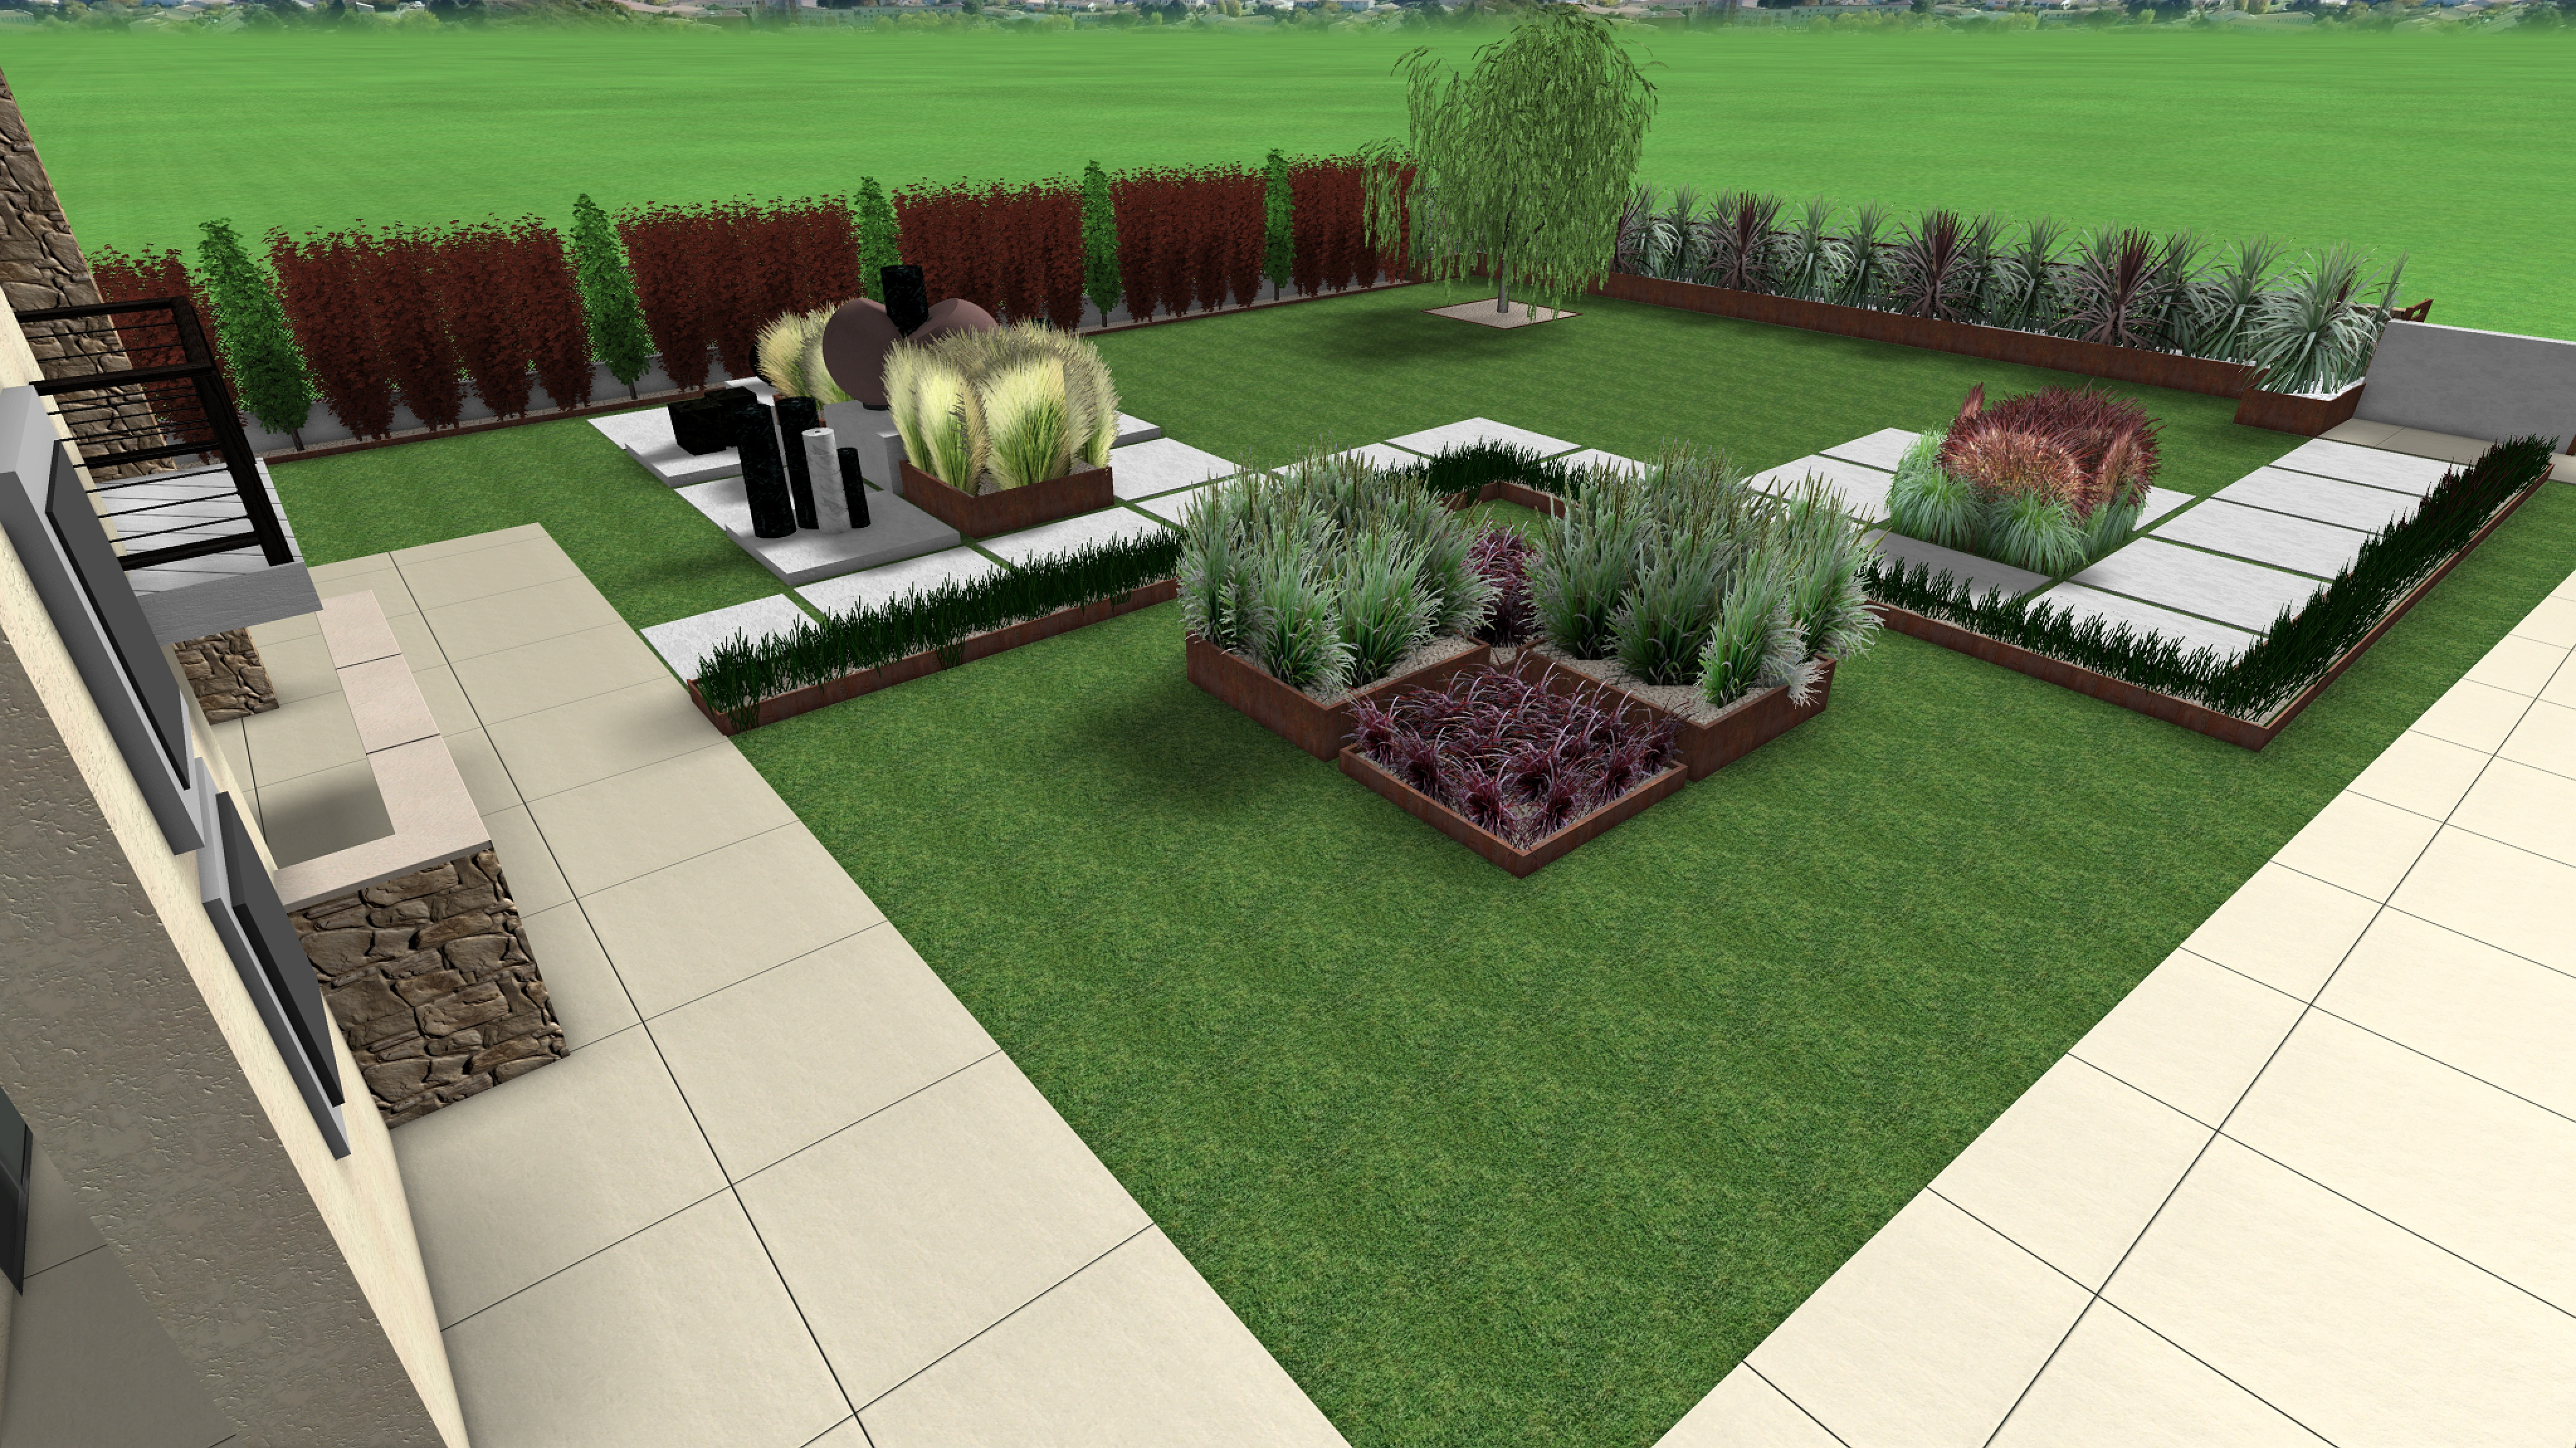 Progetto giardino 1 arkadia design for Giardino design